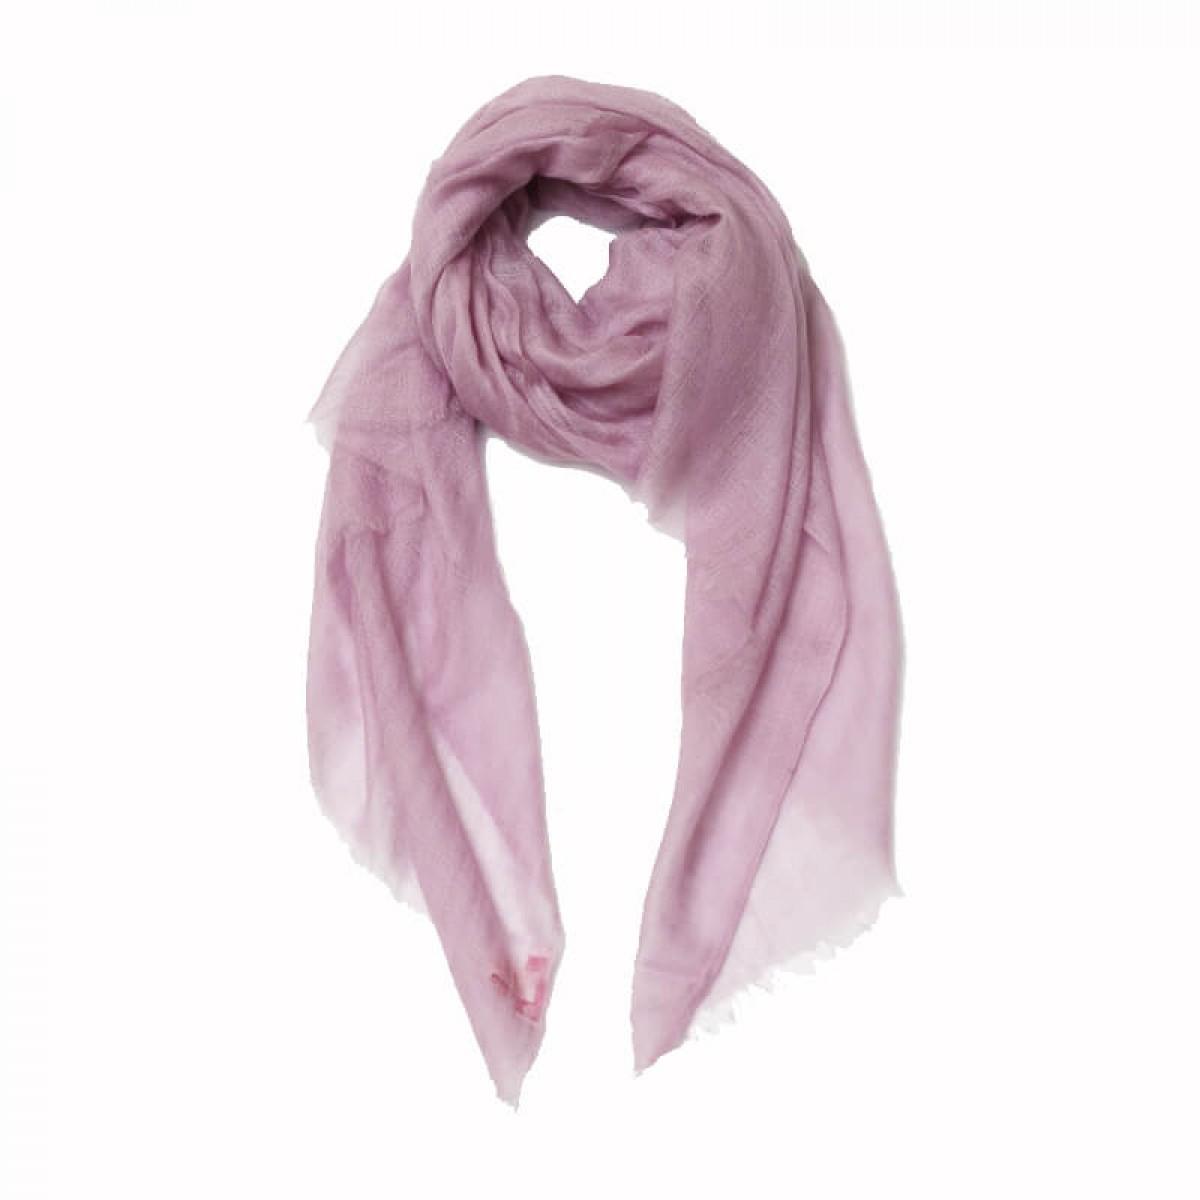 Lilac summer sheer pashmina scarf